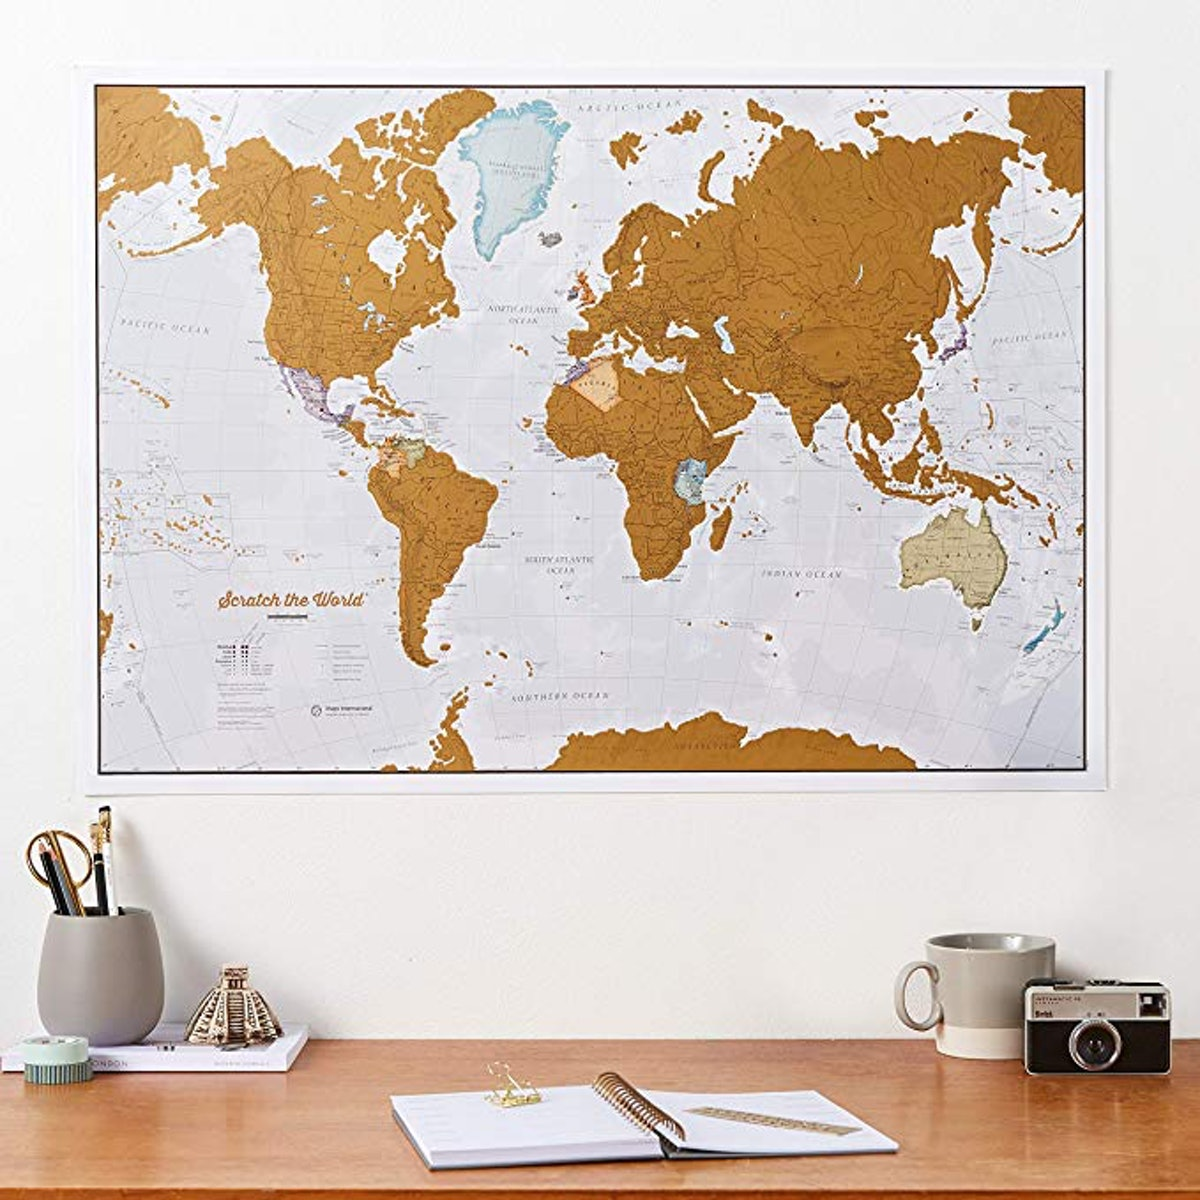 Maps International Scratch The World Travel Map